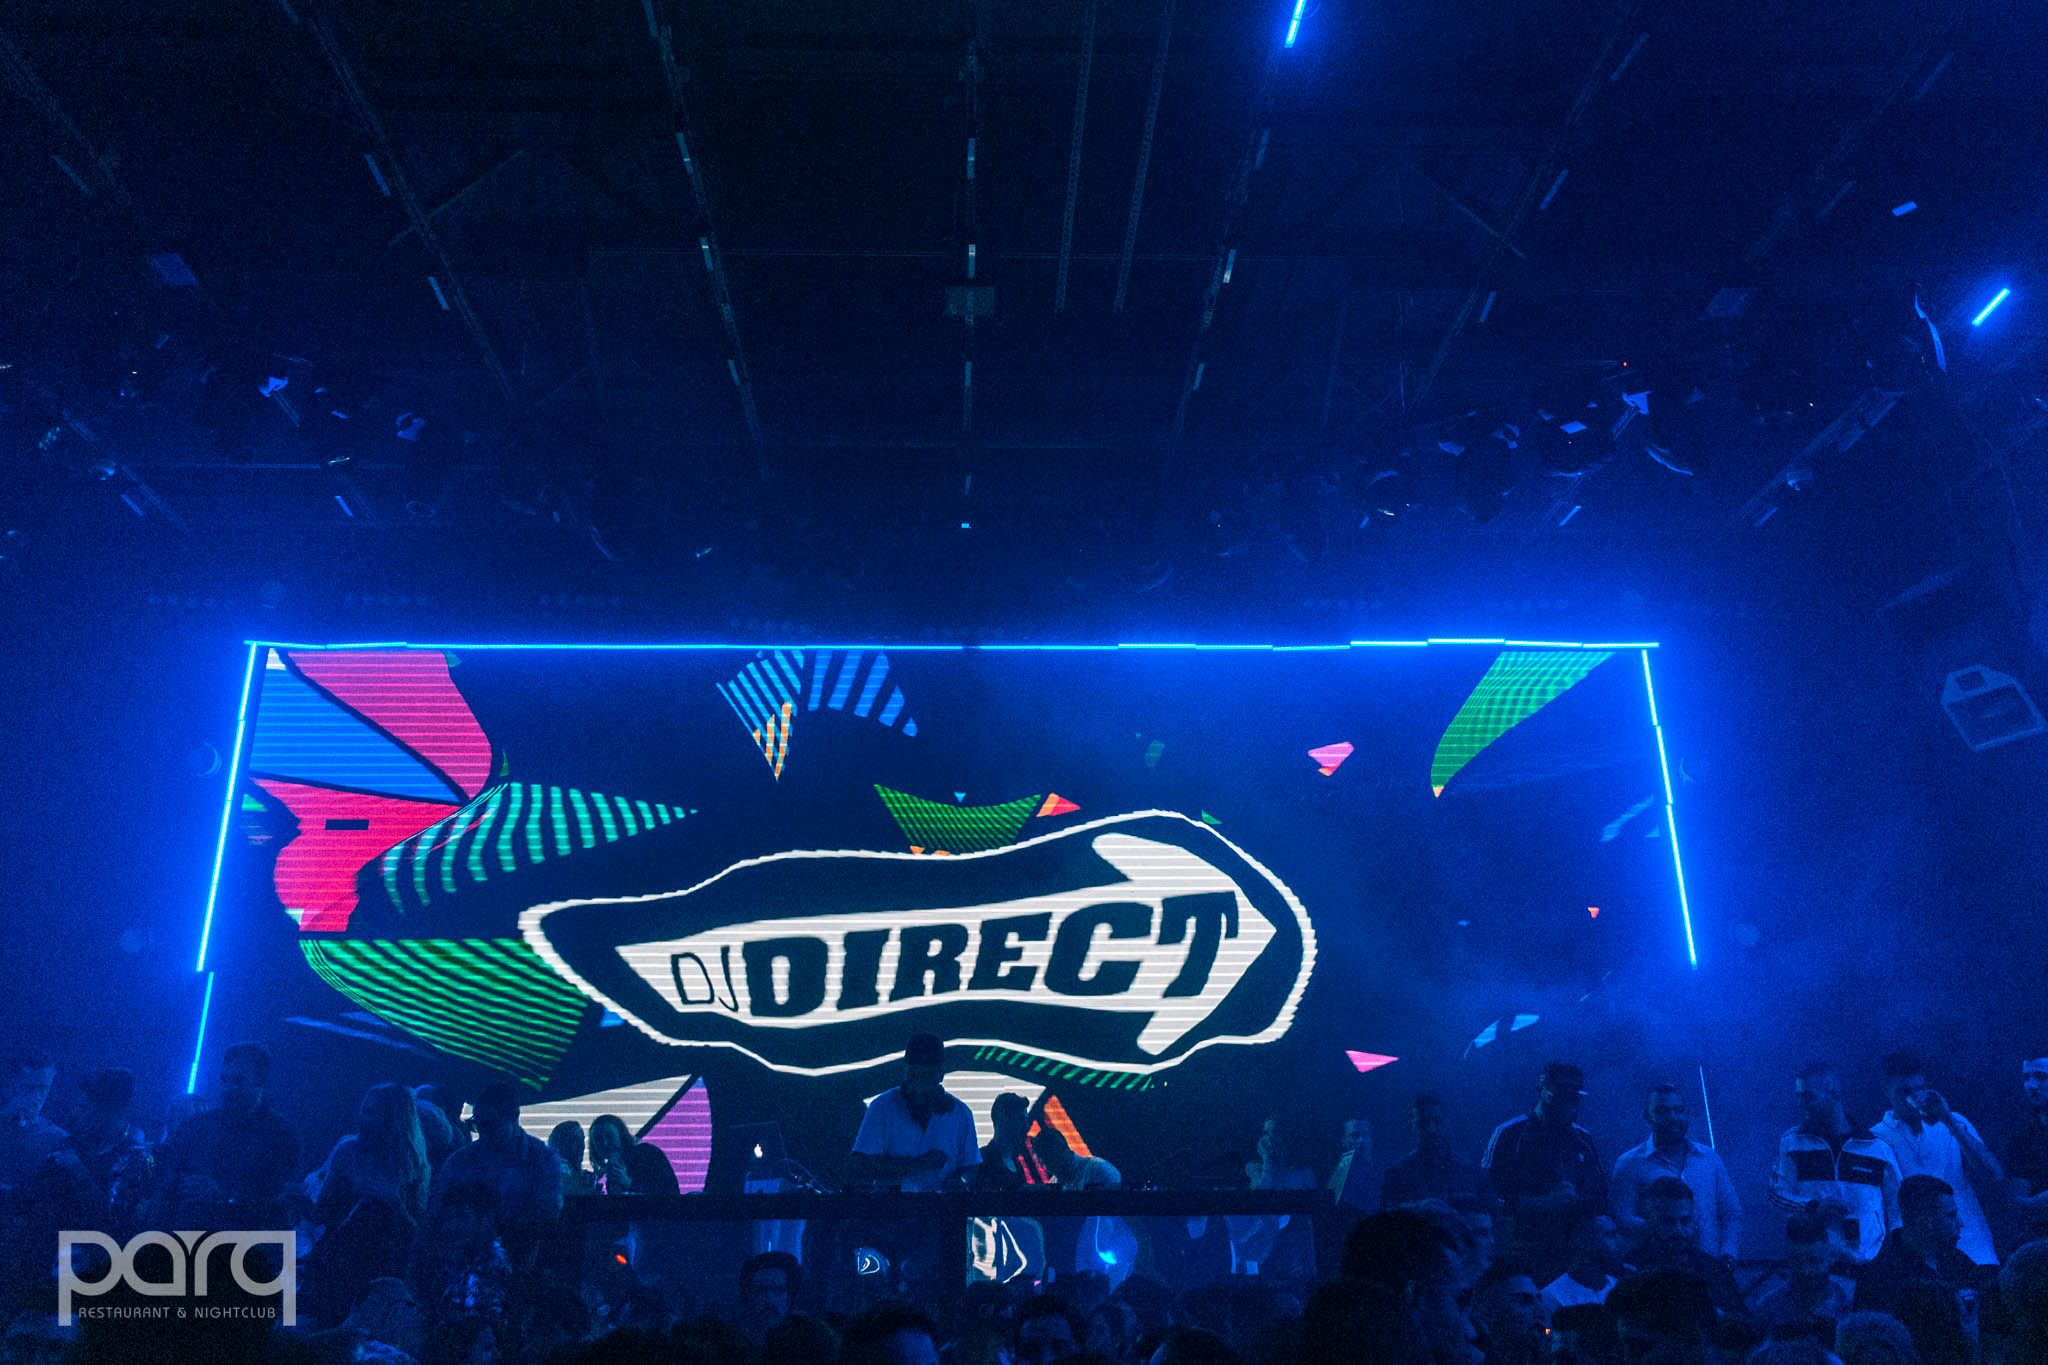 11.17.18 Parq - Direct-11.jpg